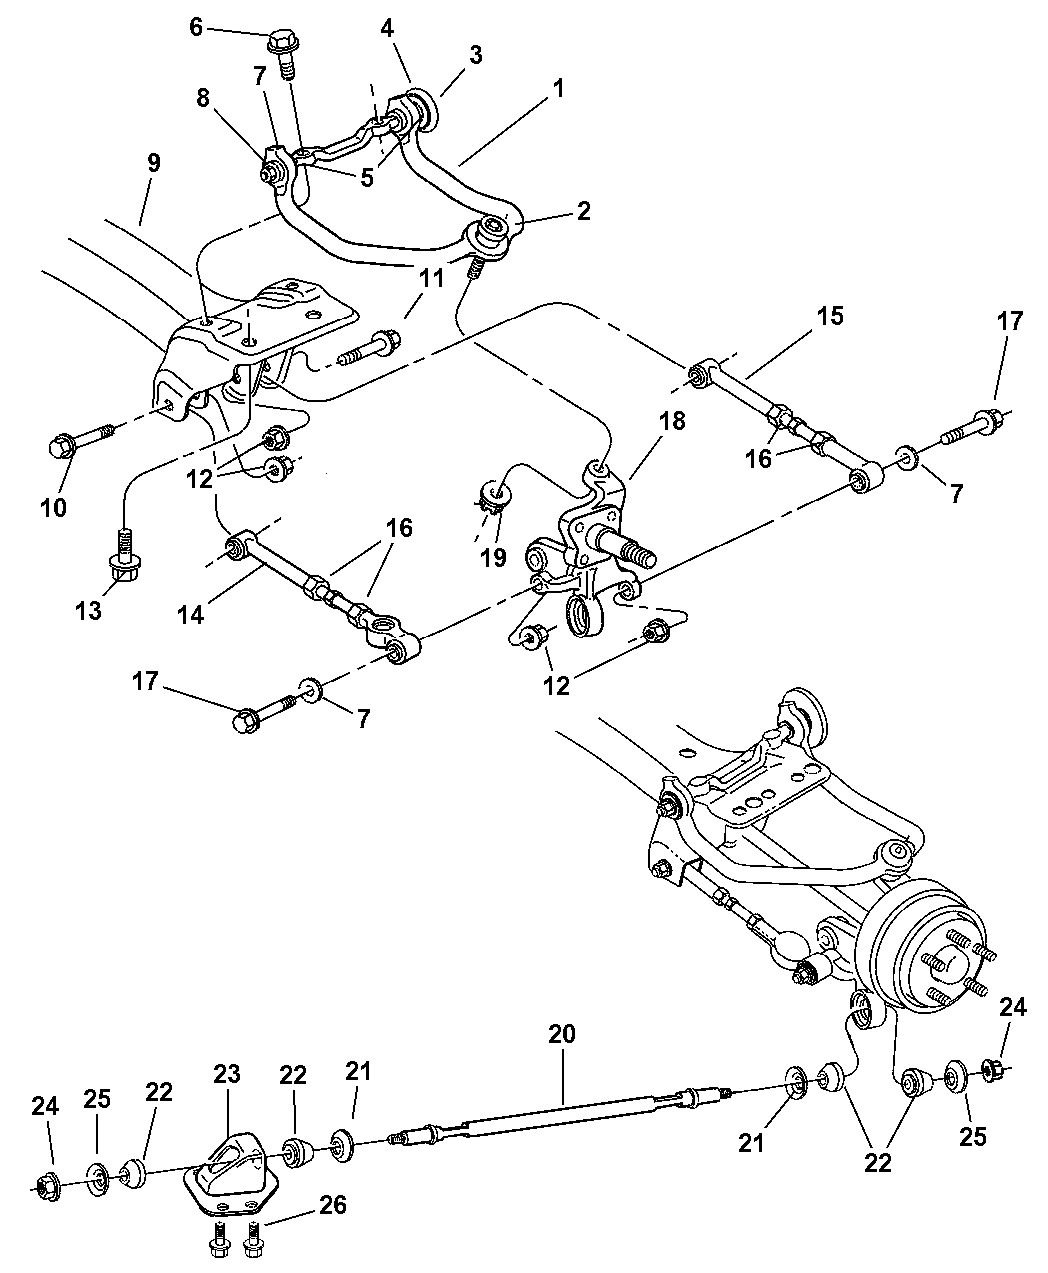 2005 dodge stratus parts diagram  u2022 wiring diagram for free